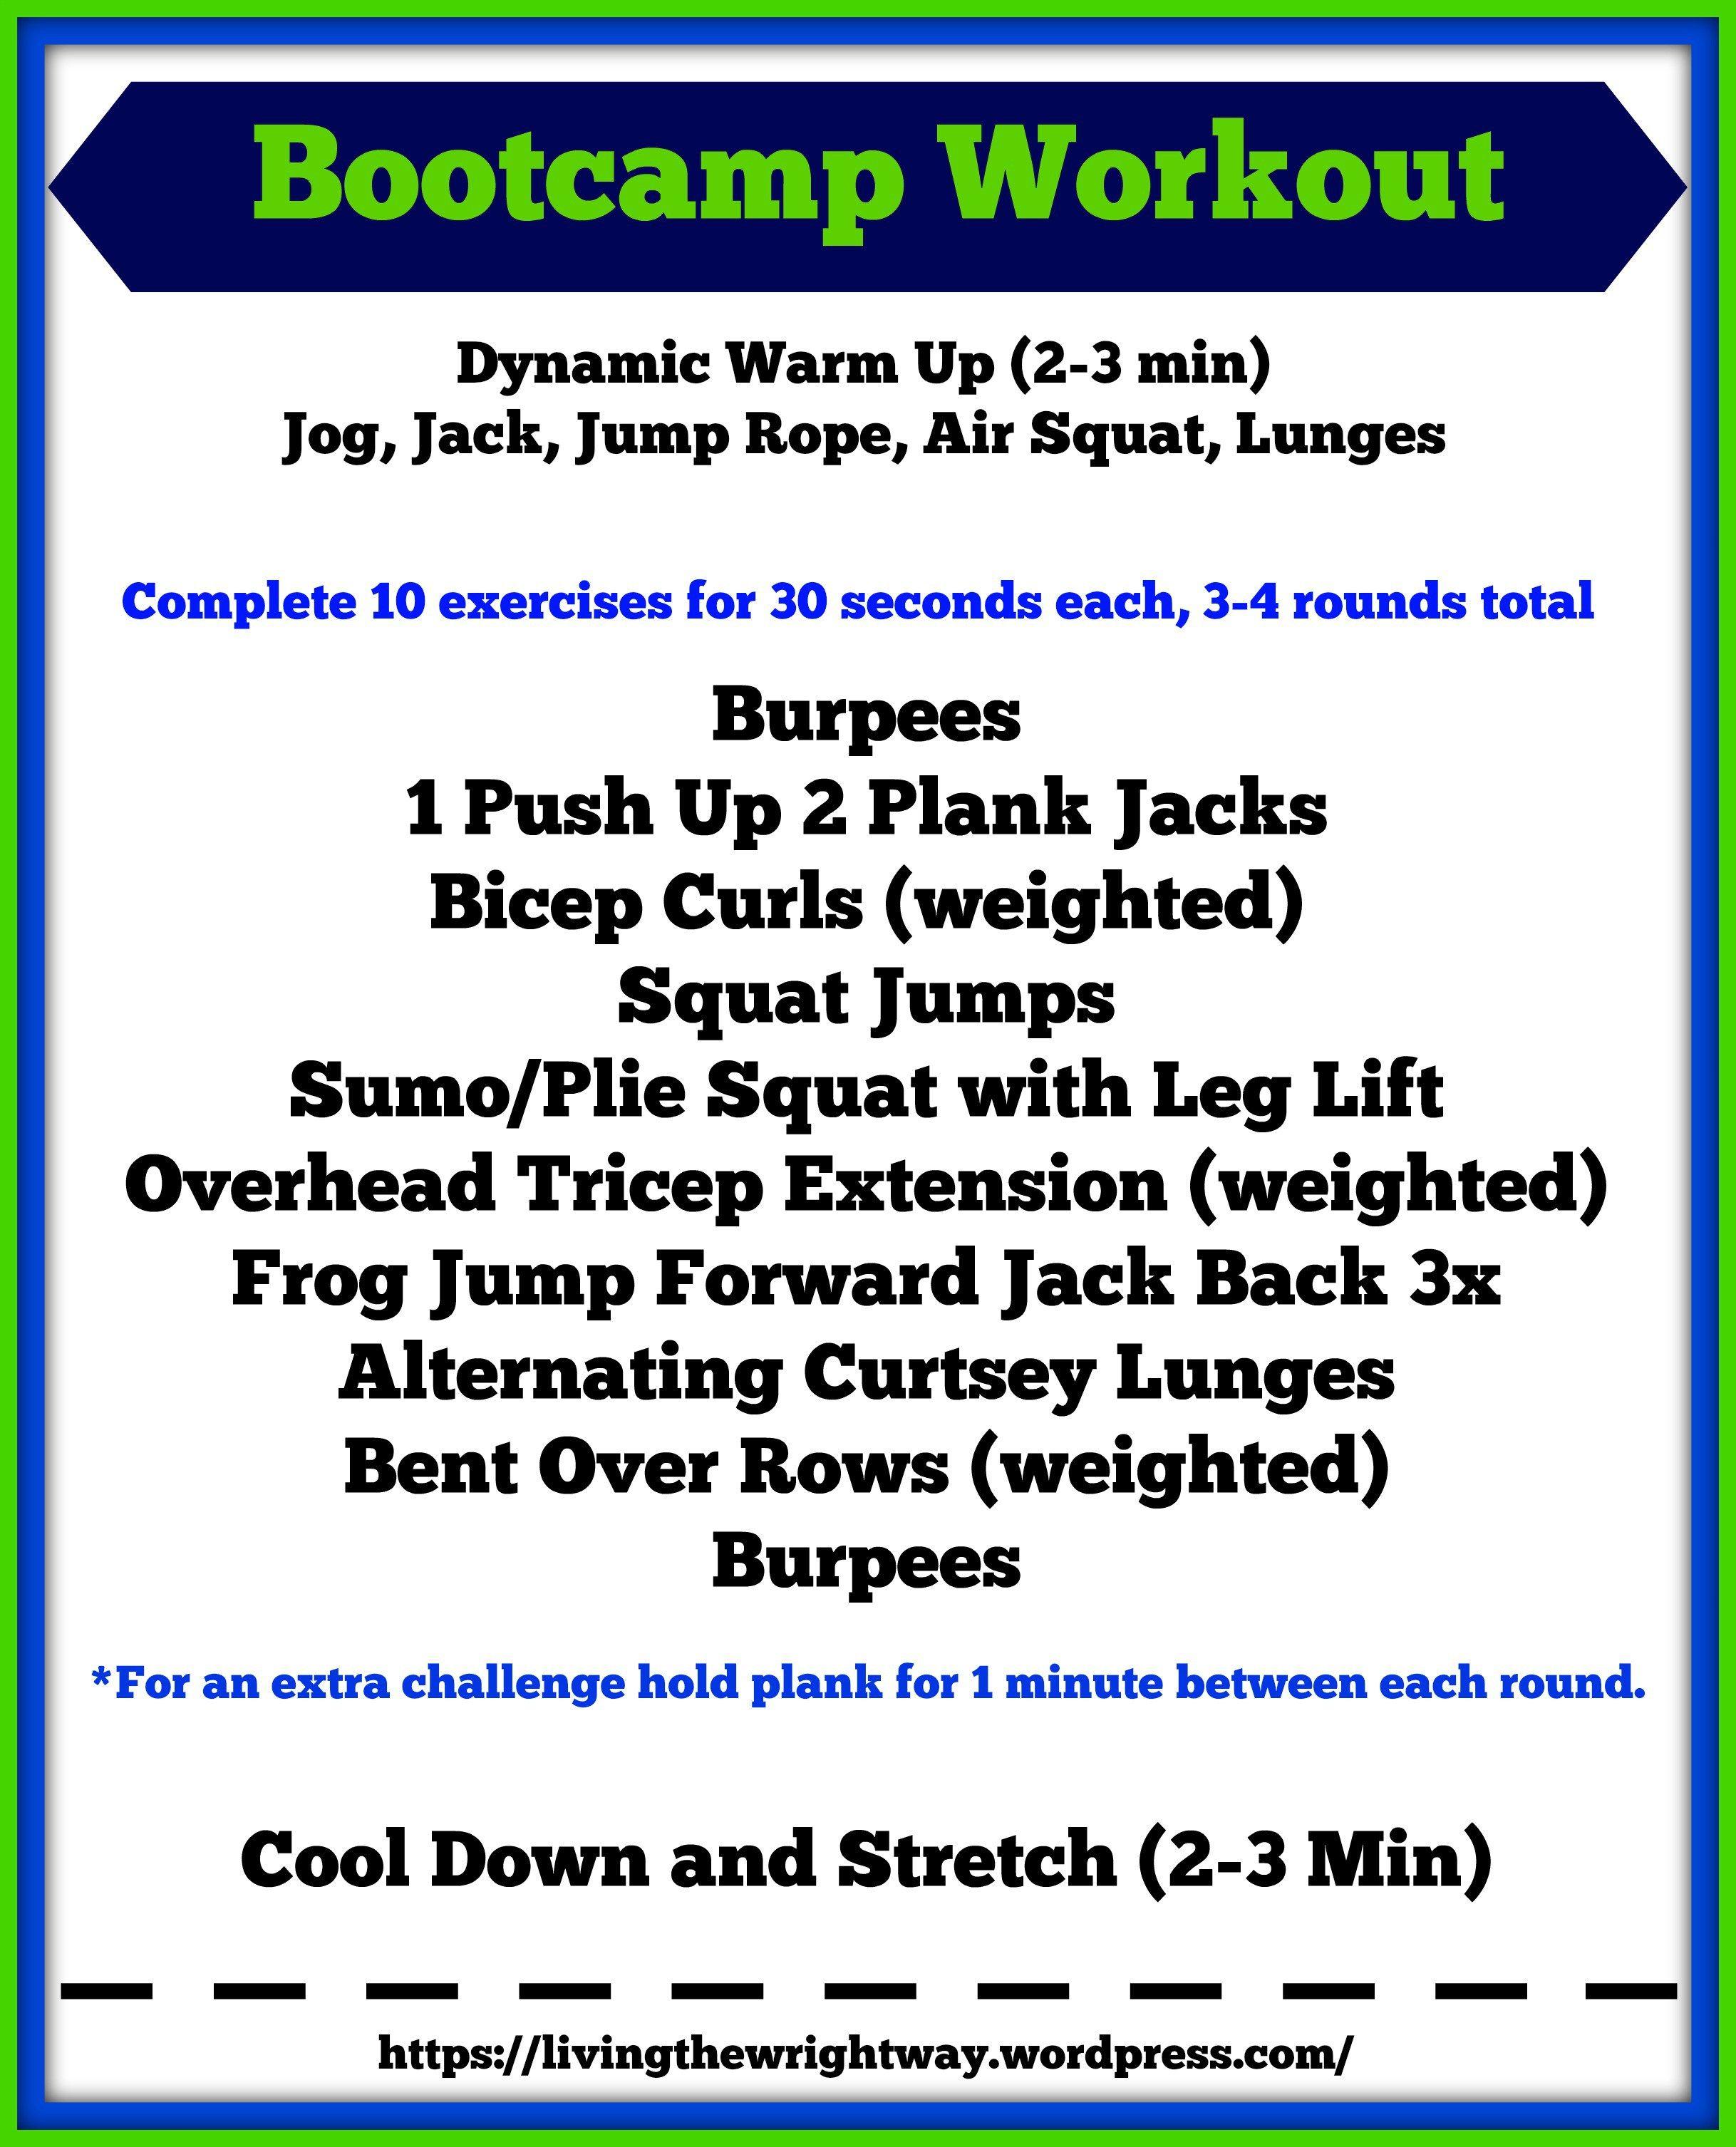 Boot Camp Workout | Workout | Boot camp workout, Gym ...